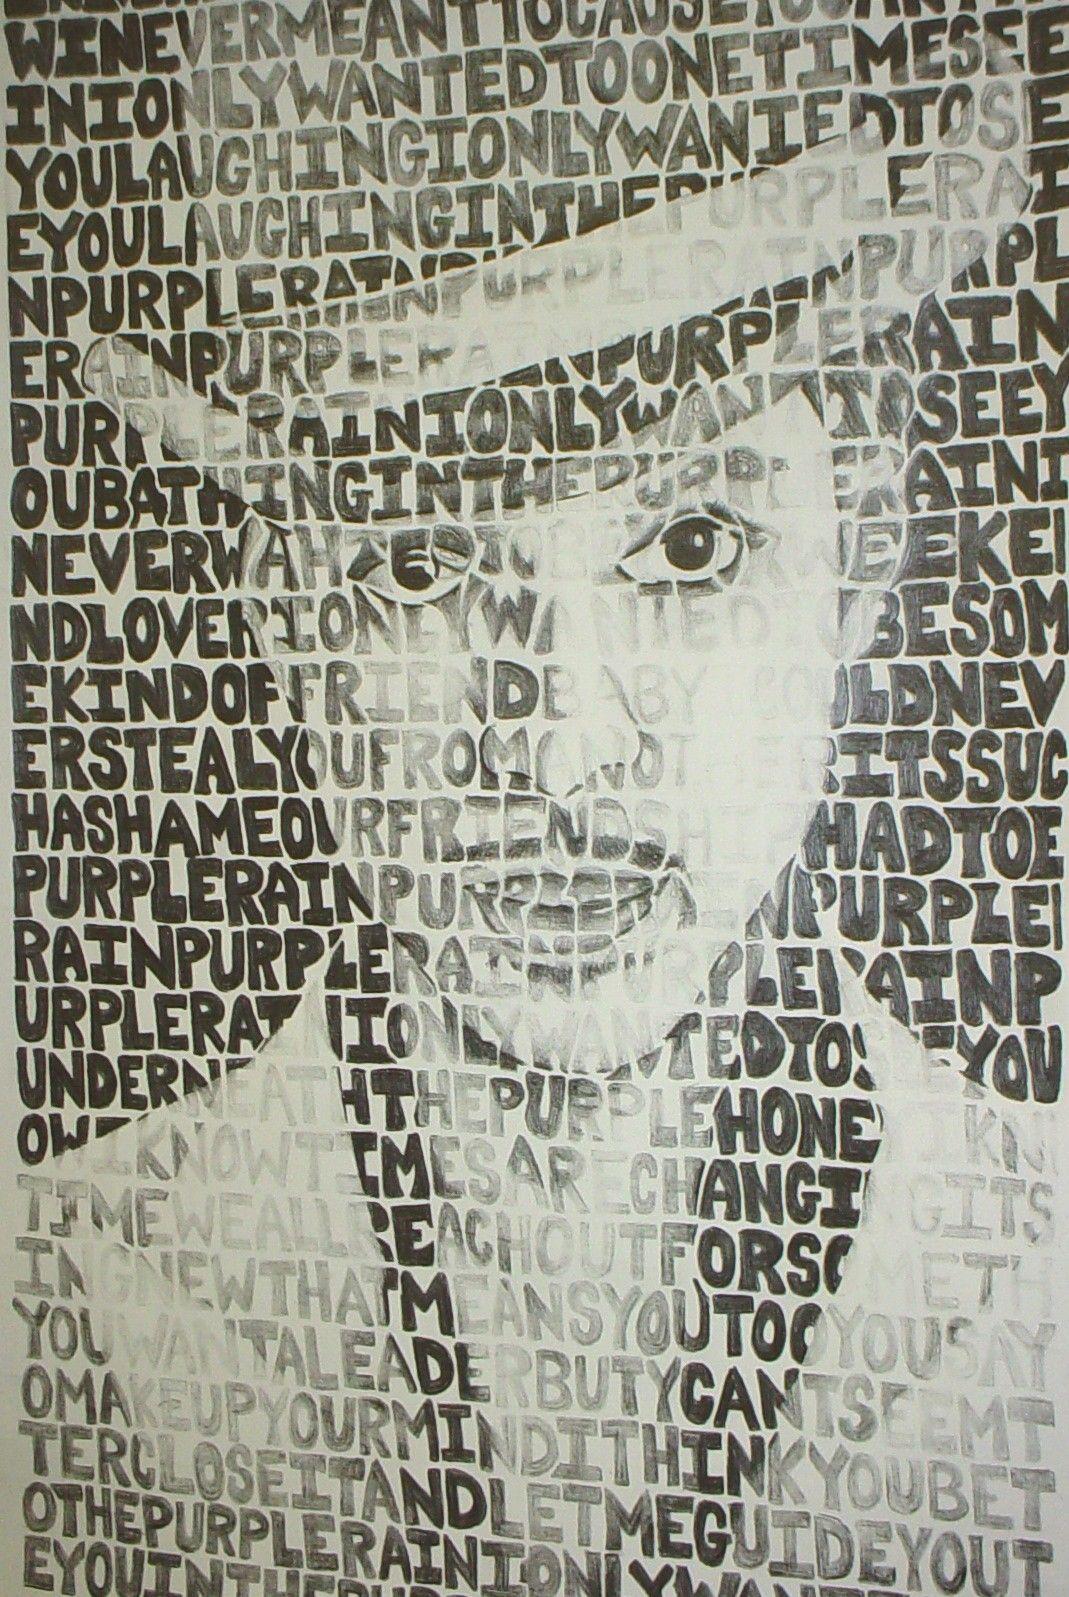 Pin Joe Stewart Micrography Art With Text Ap